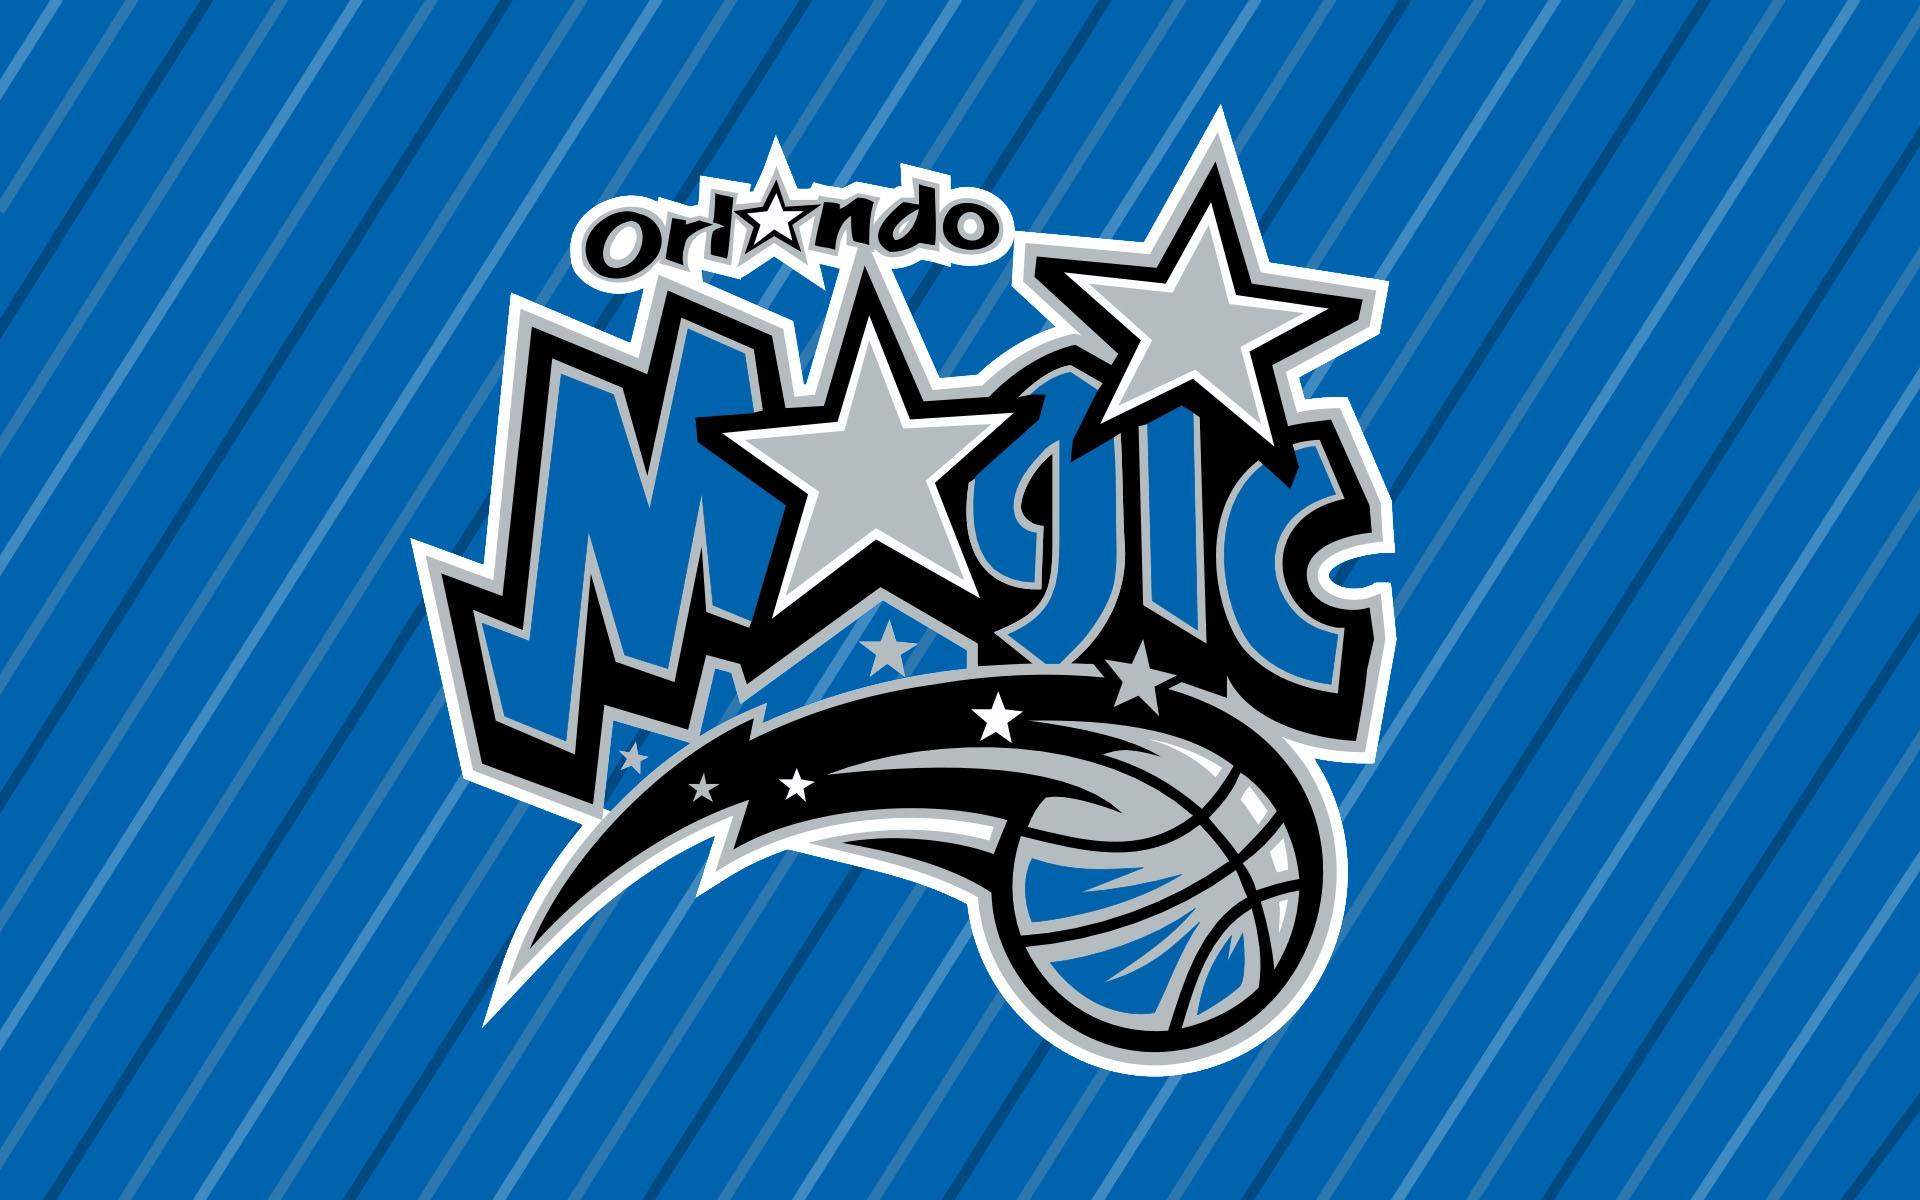 NBA Orlando Magic Custom Alternative Logo - 1920x1200 - Full HD 16/10 ...